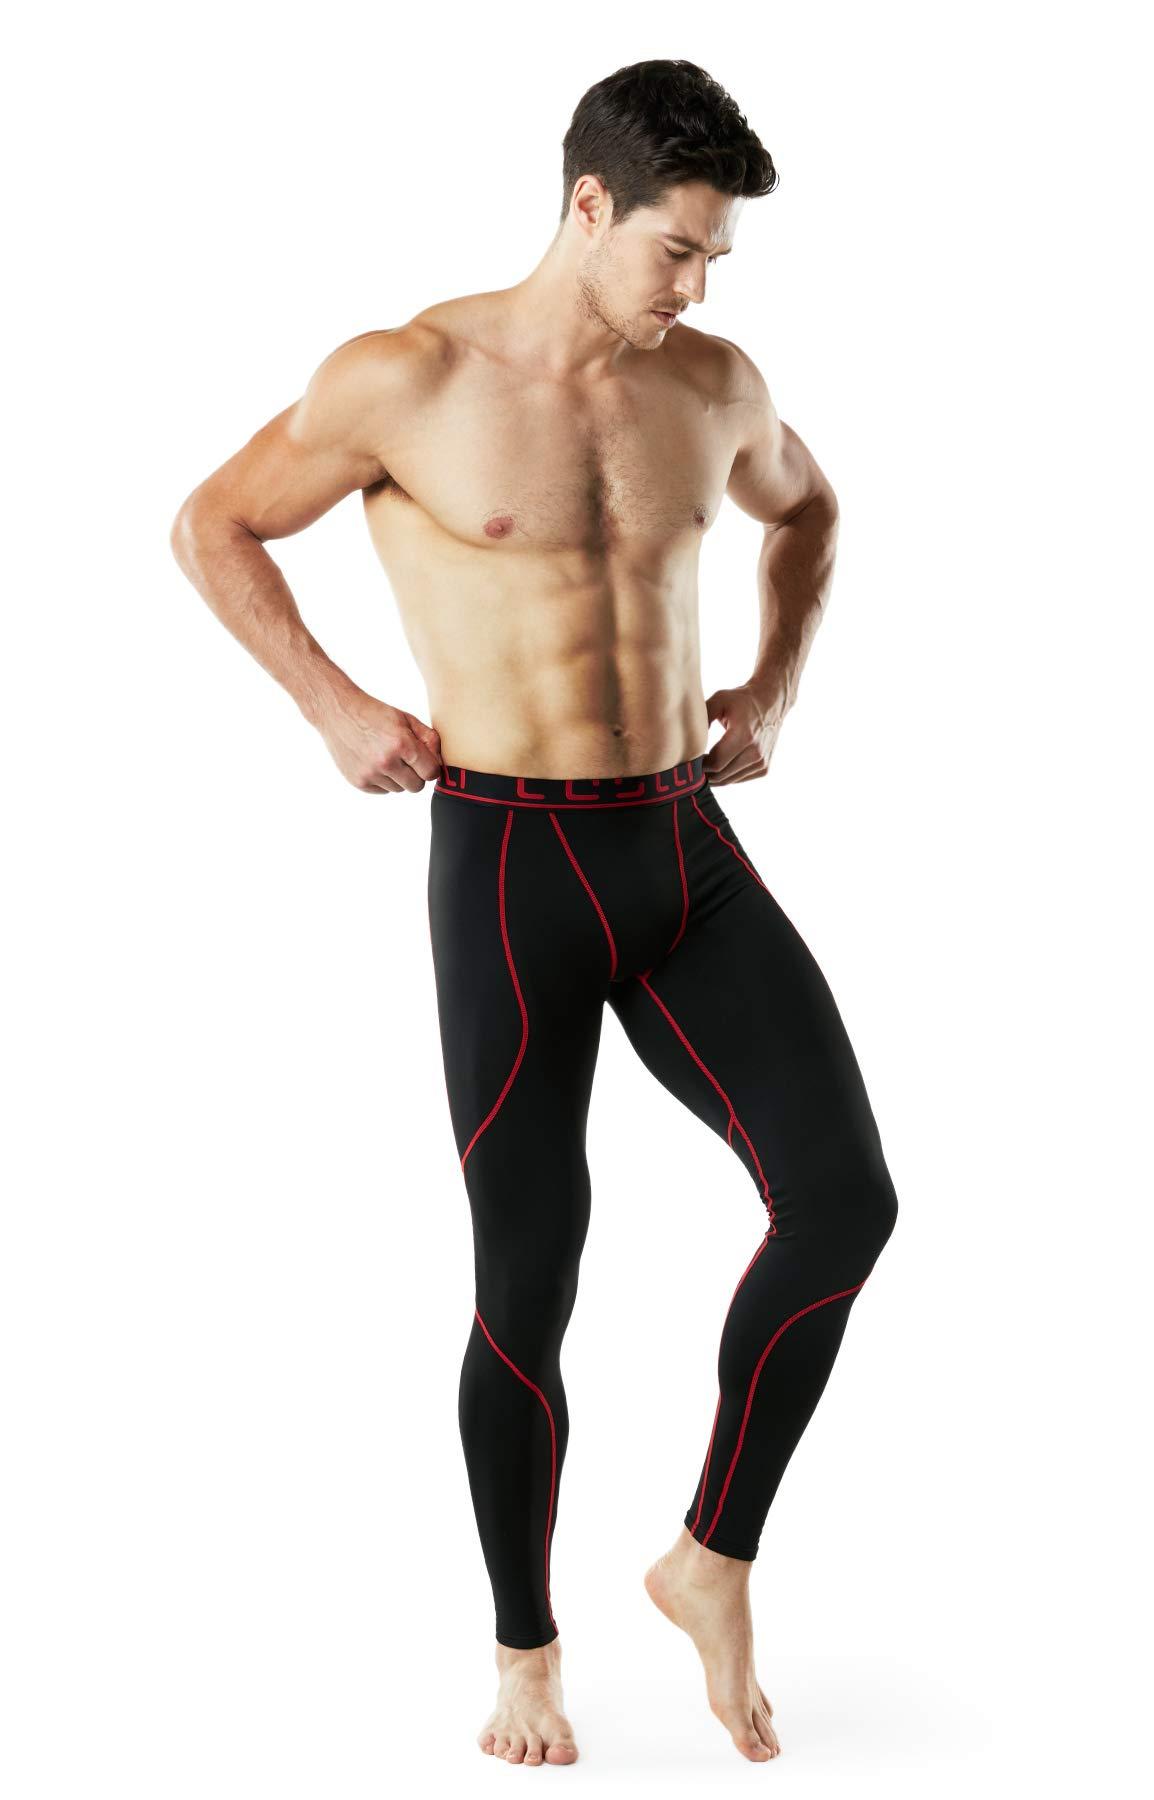 TM-YUP43-KKR_X-Small Tesla Men's Thermal Wintergear Compression Baselayer Pants Leggings Tights YUP43 by TSLA (Image #7)